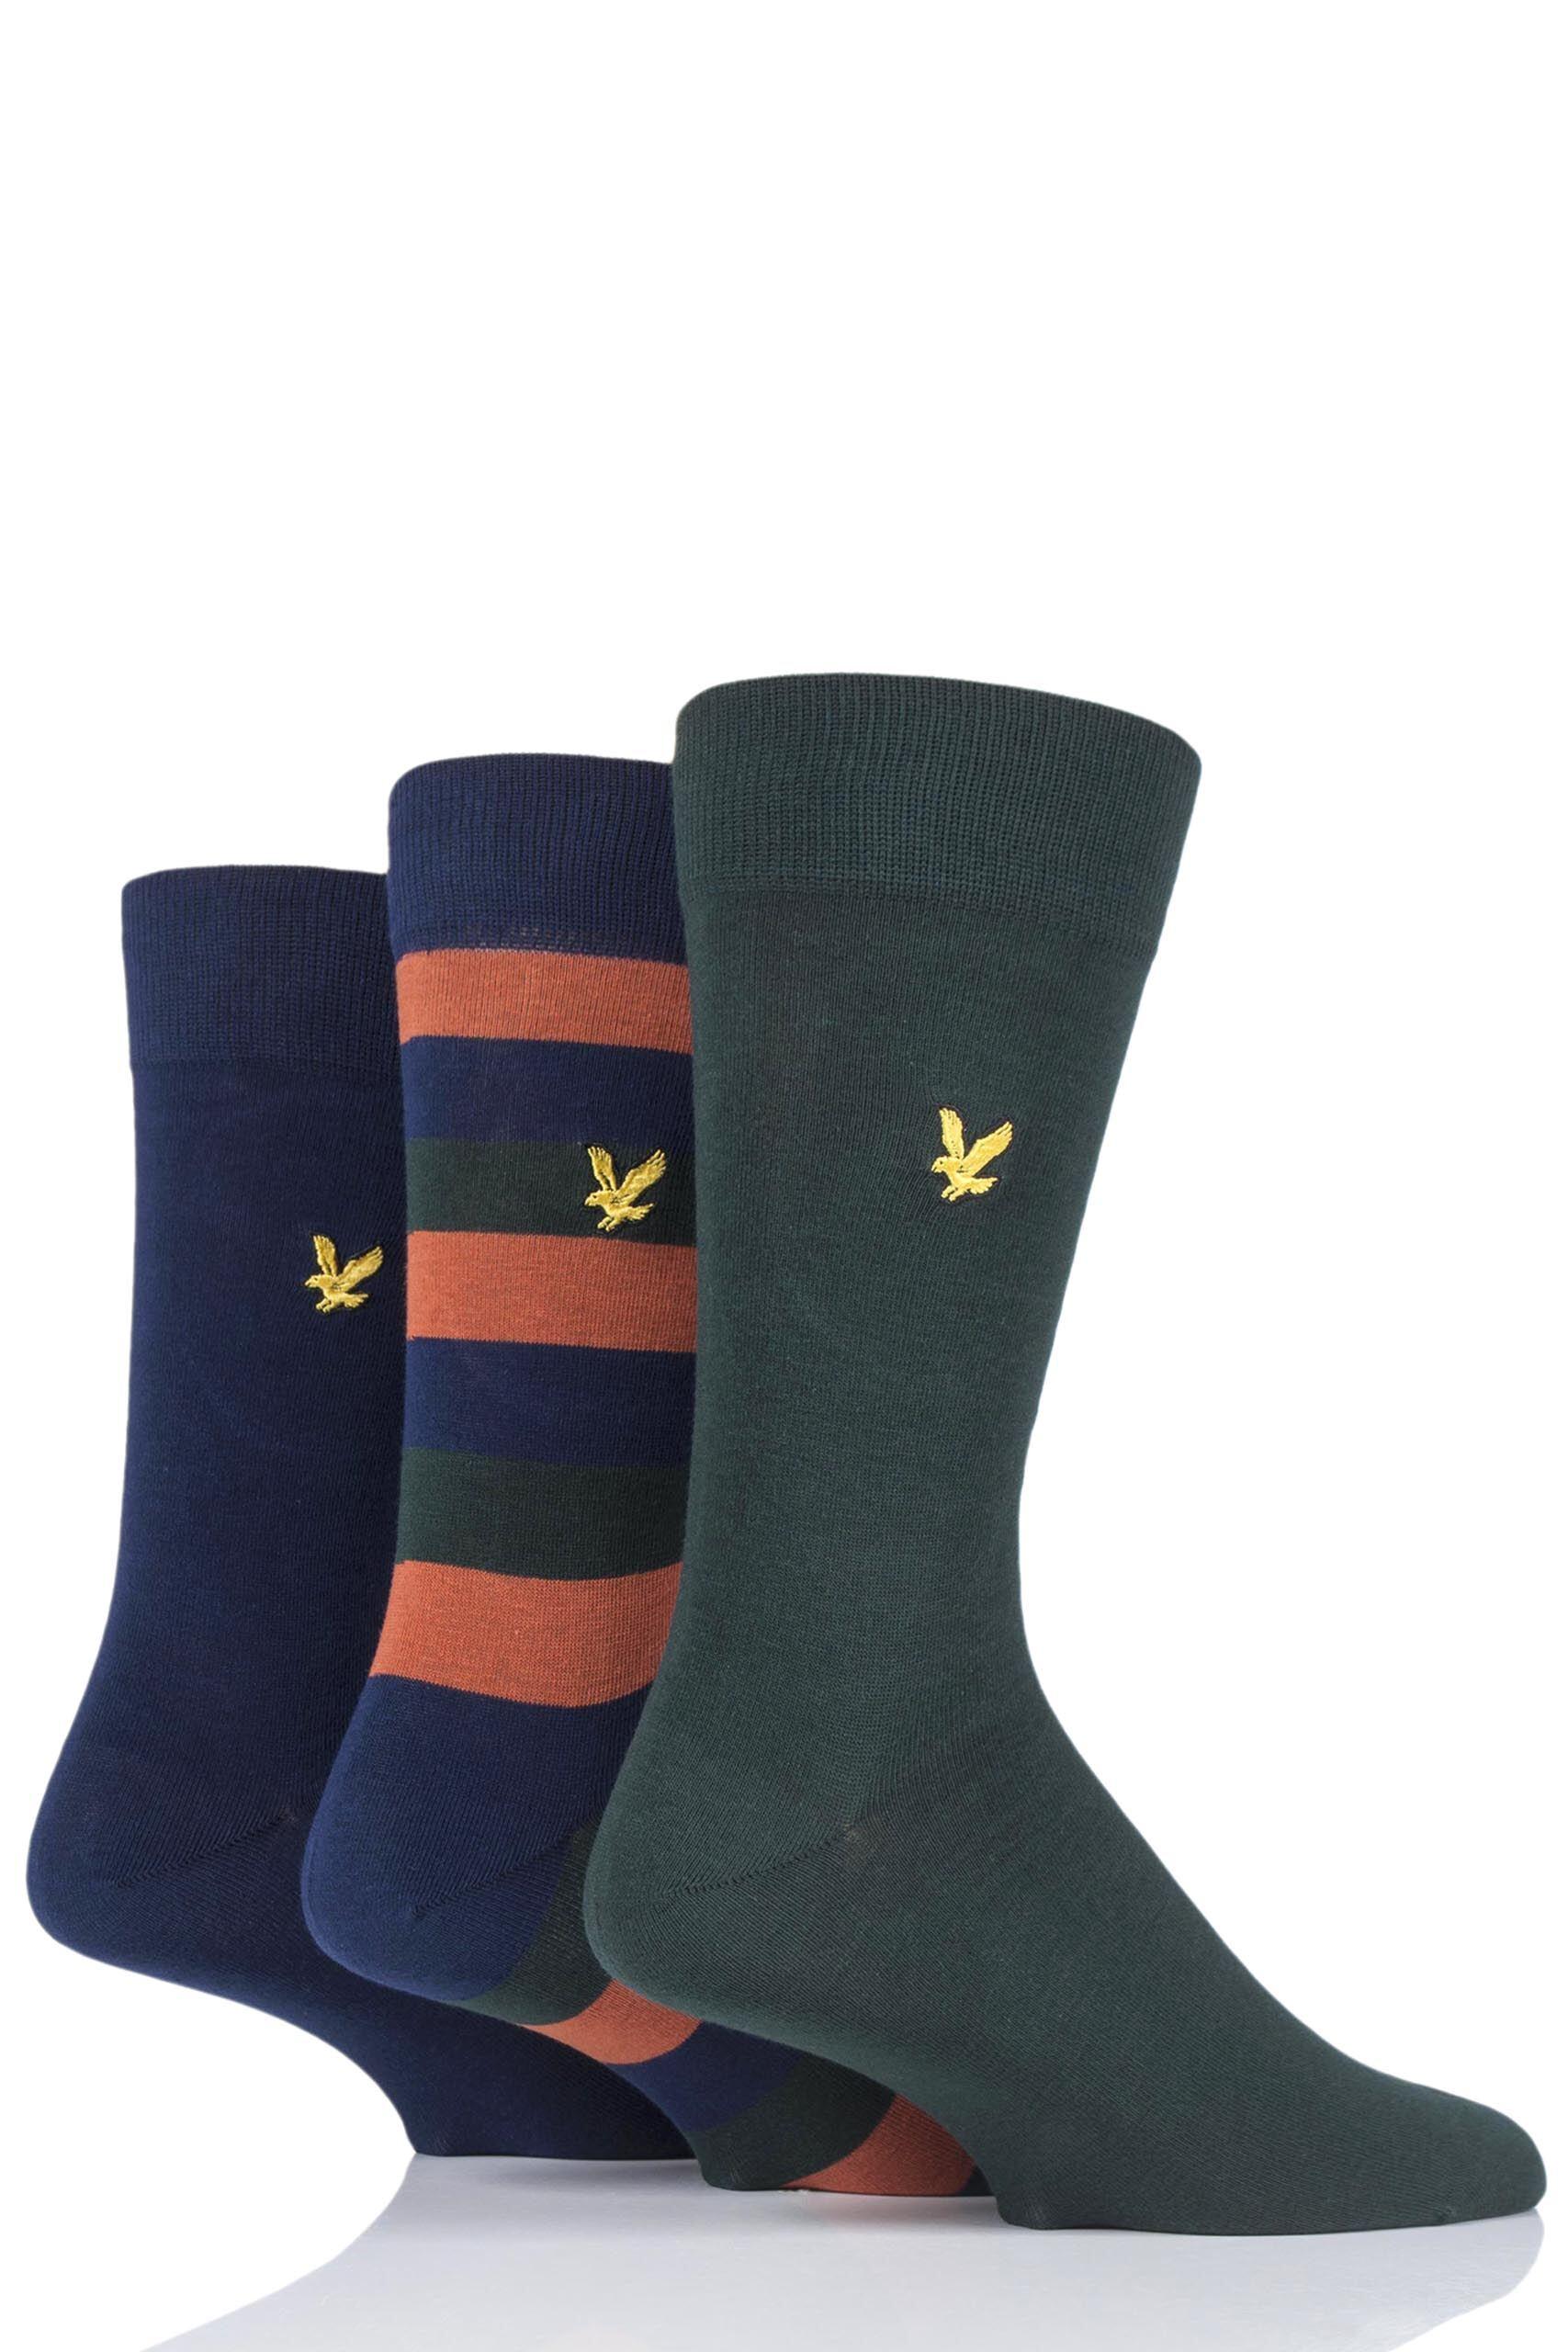 Image of 3 Pair Pine Scotty Striped Cotton Socks Men's 7-11 Mens - Lyle & Scott